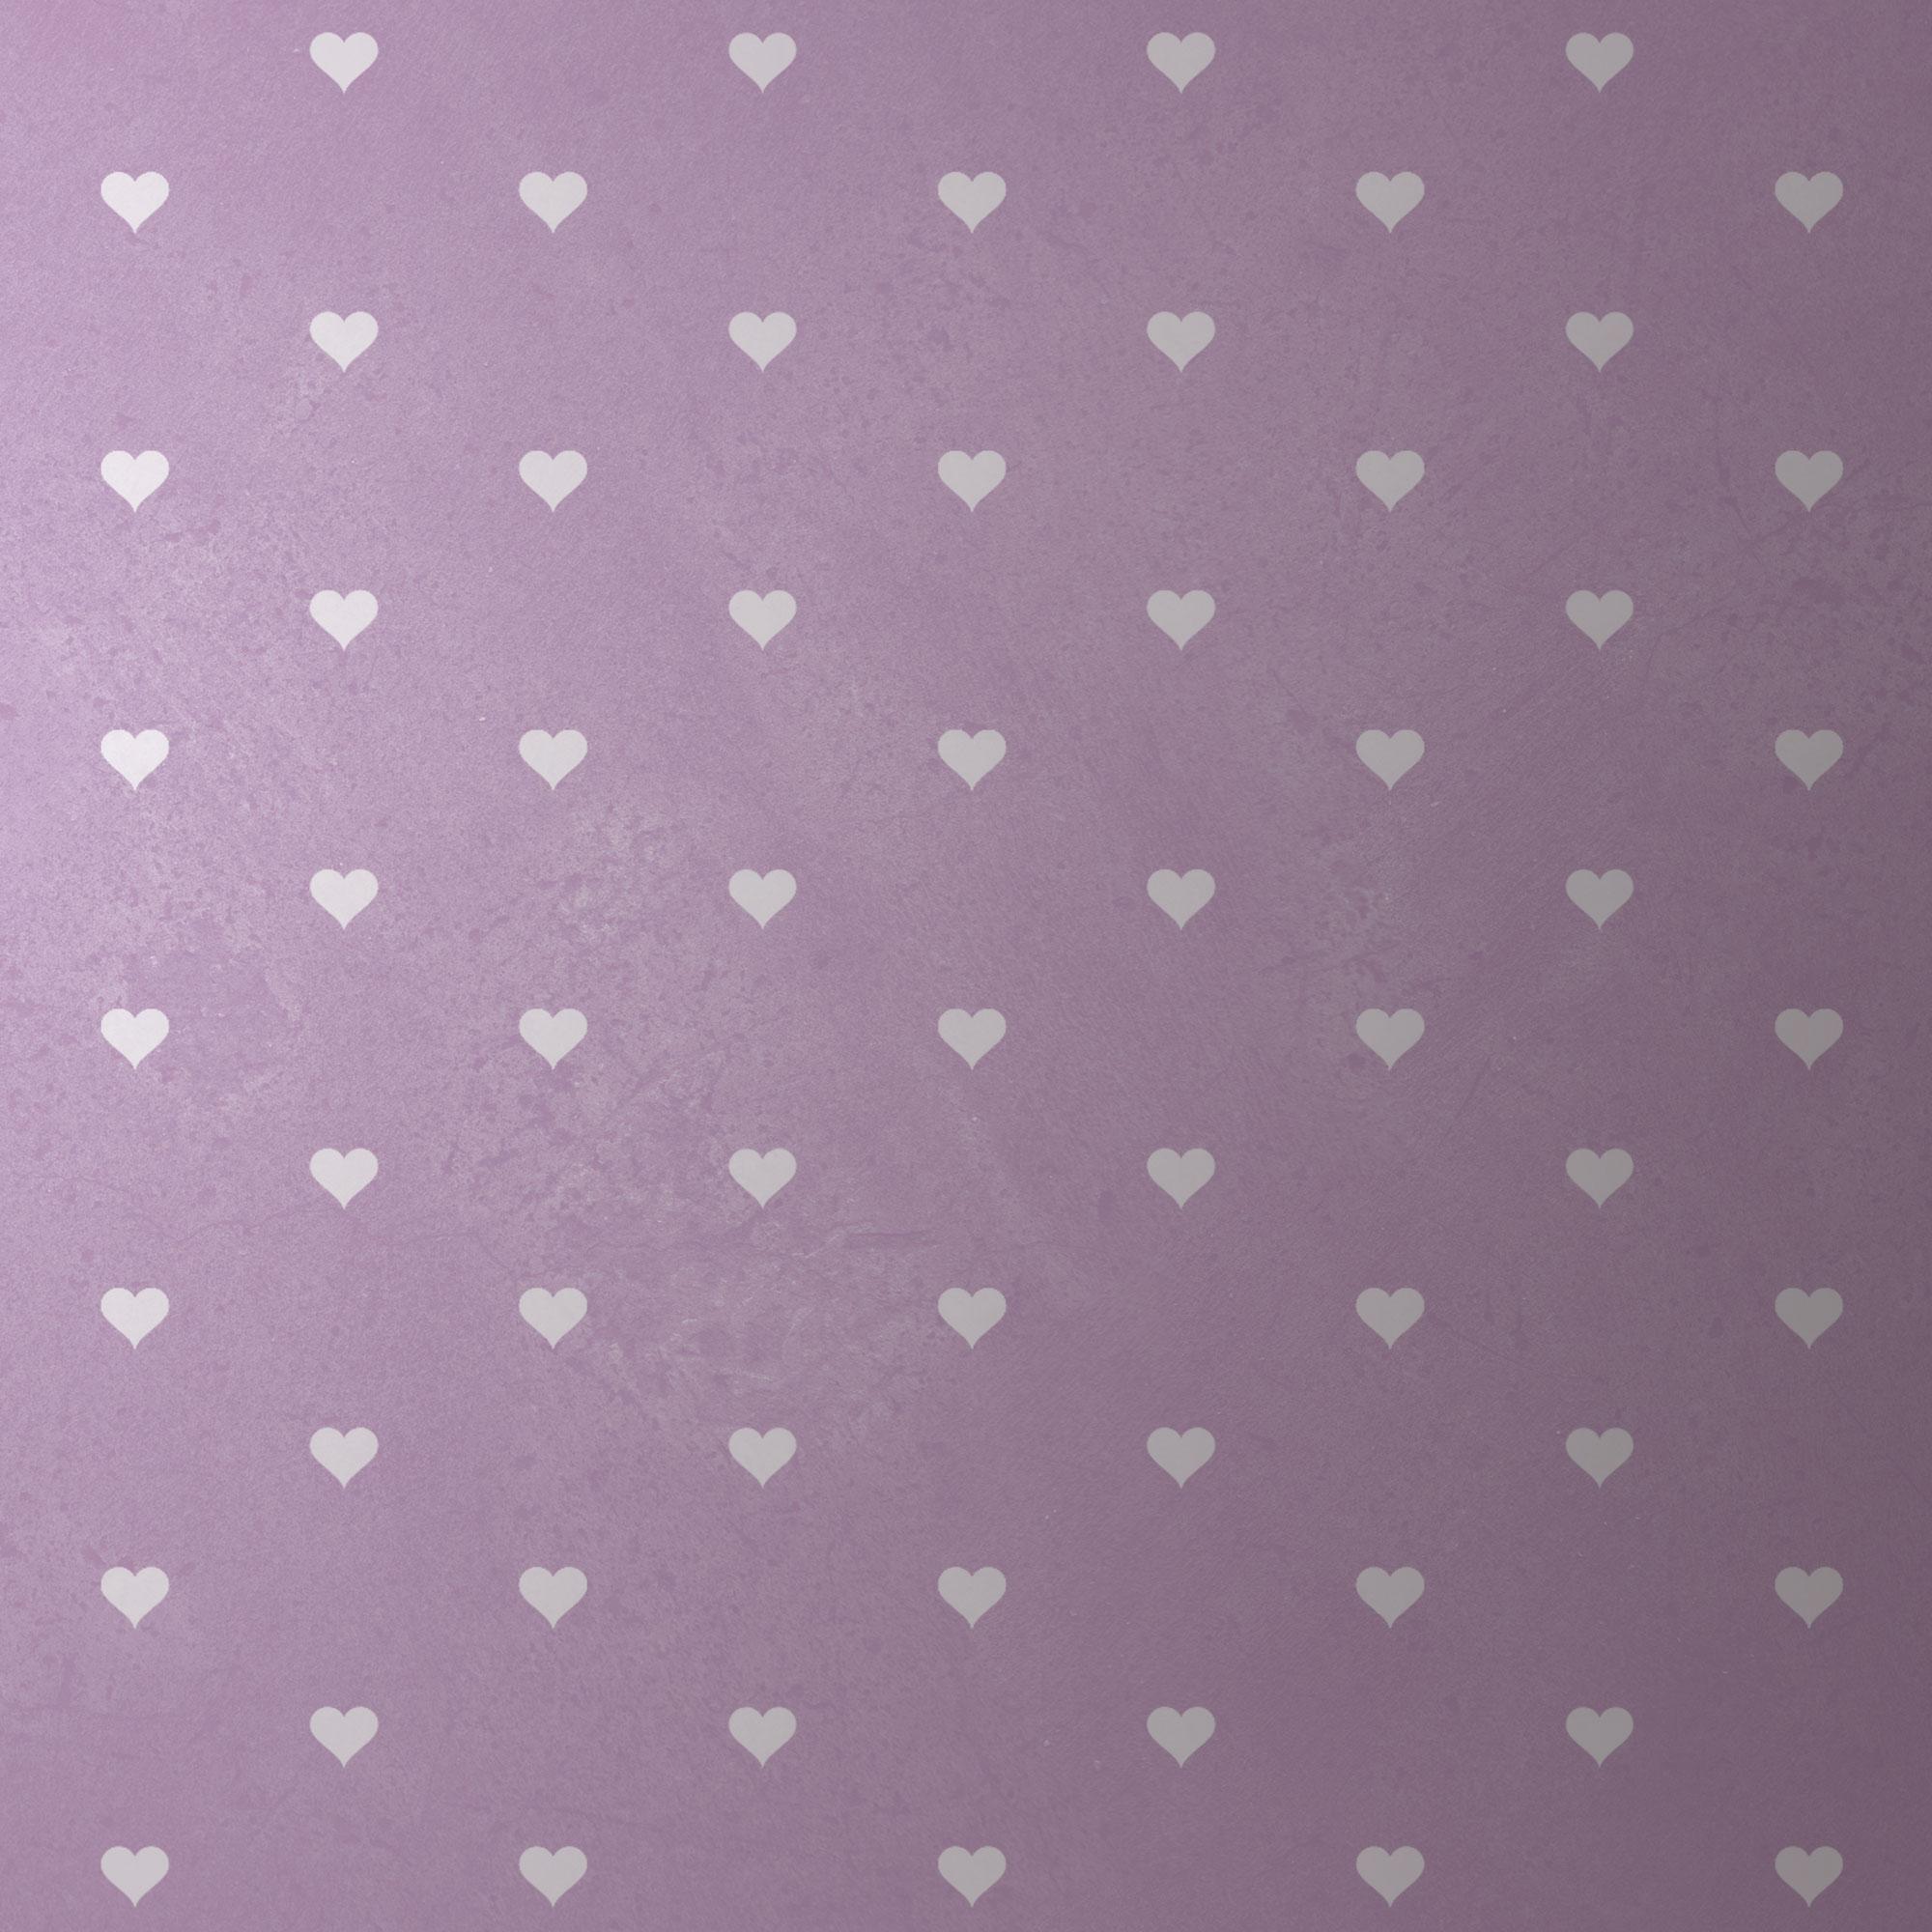 15 Kids hearts 2 4 ► szablony malarskie,szablon serca